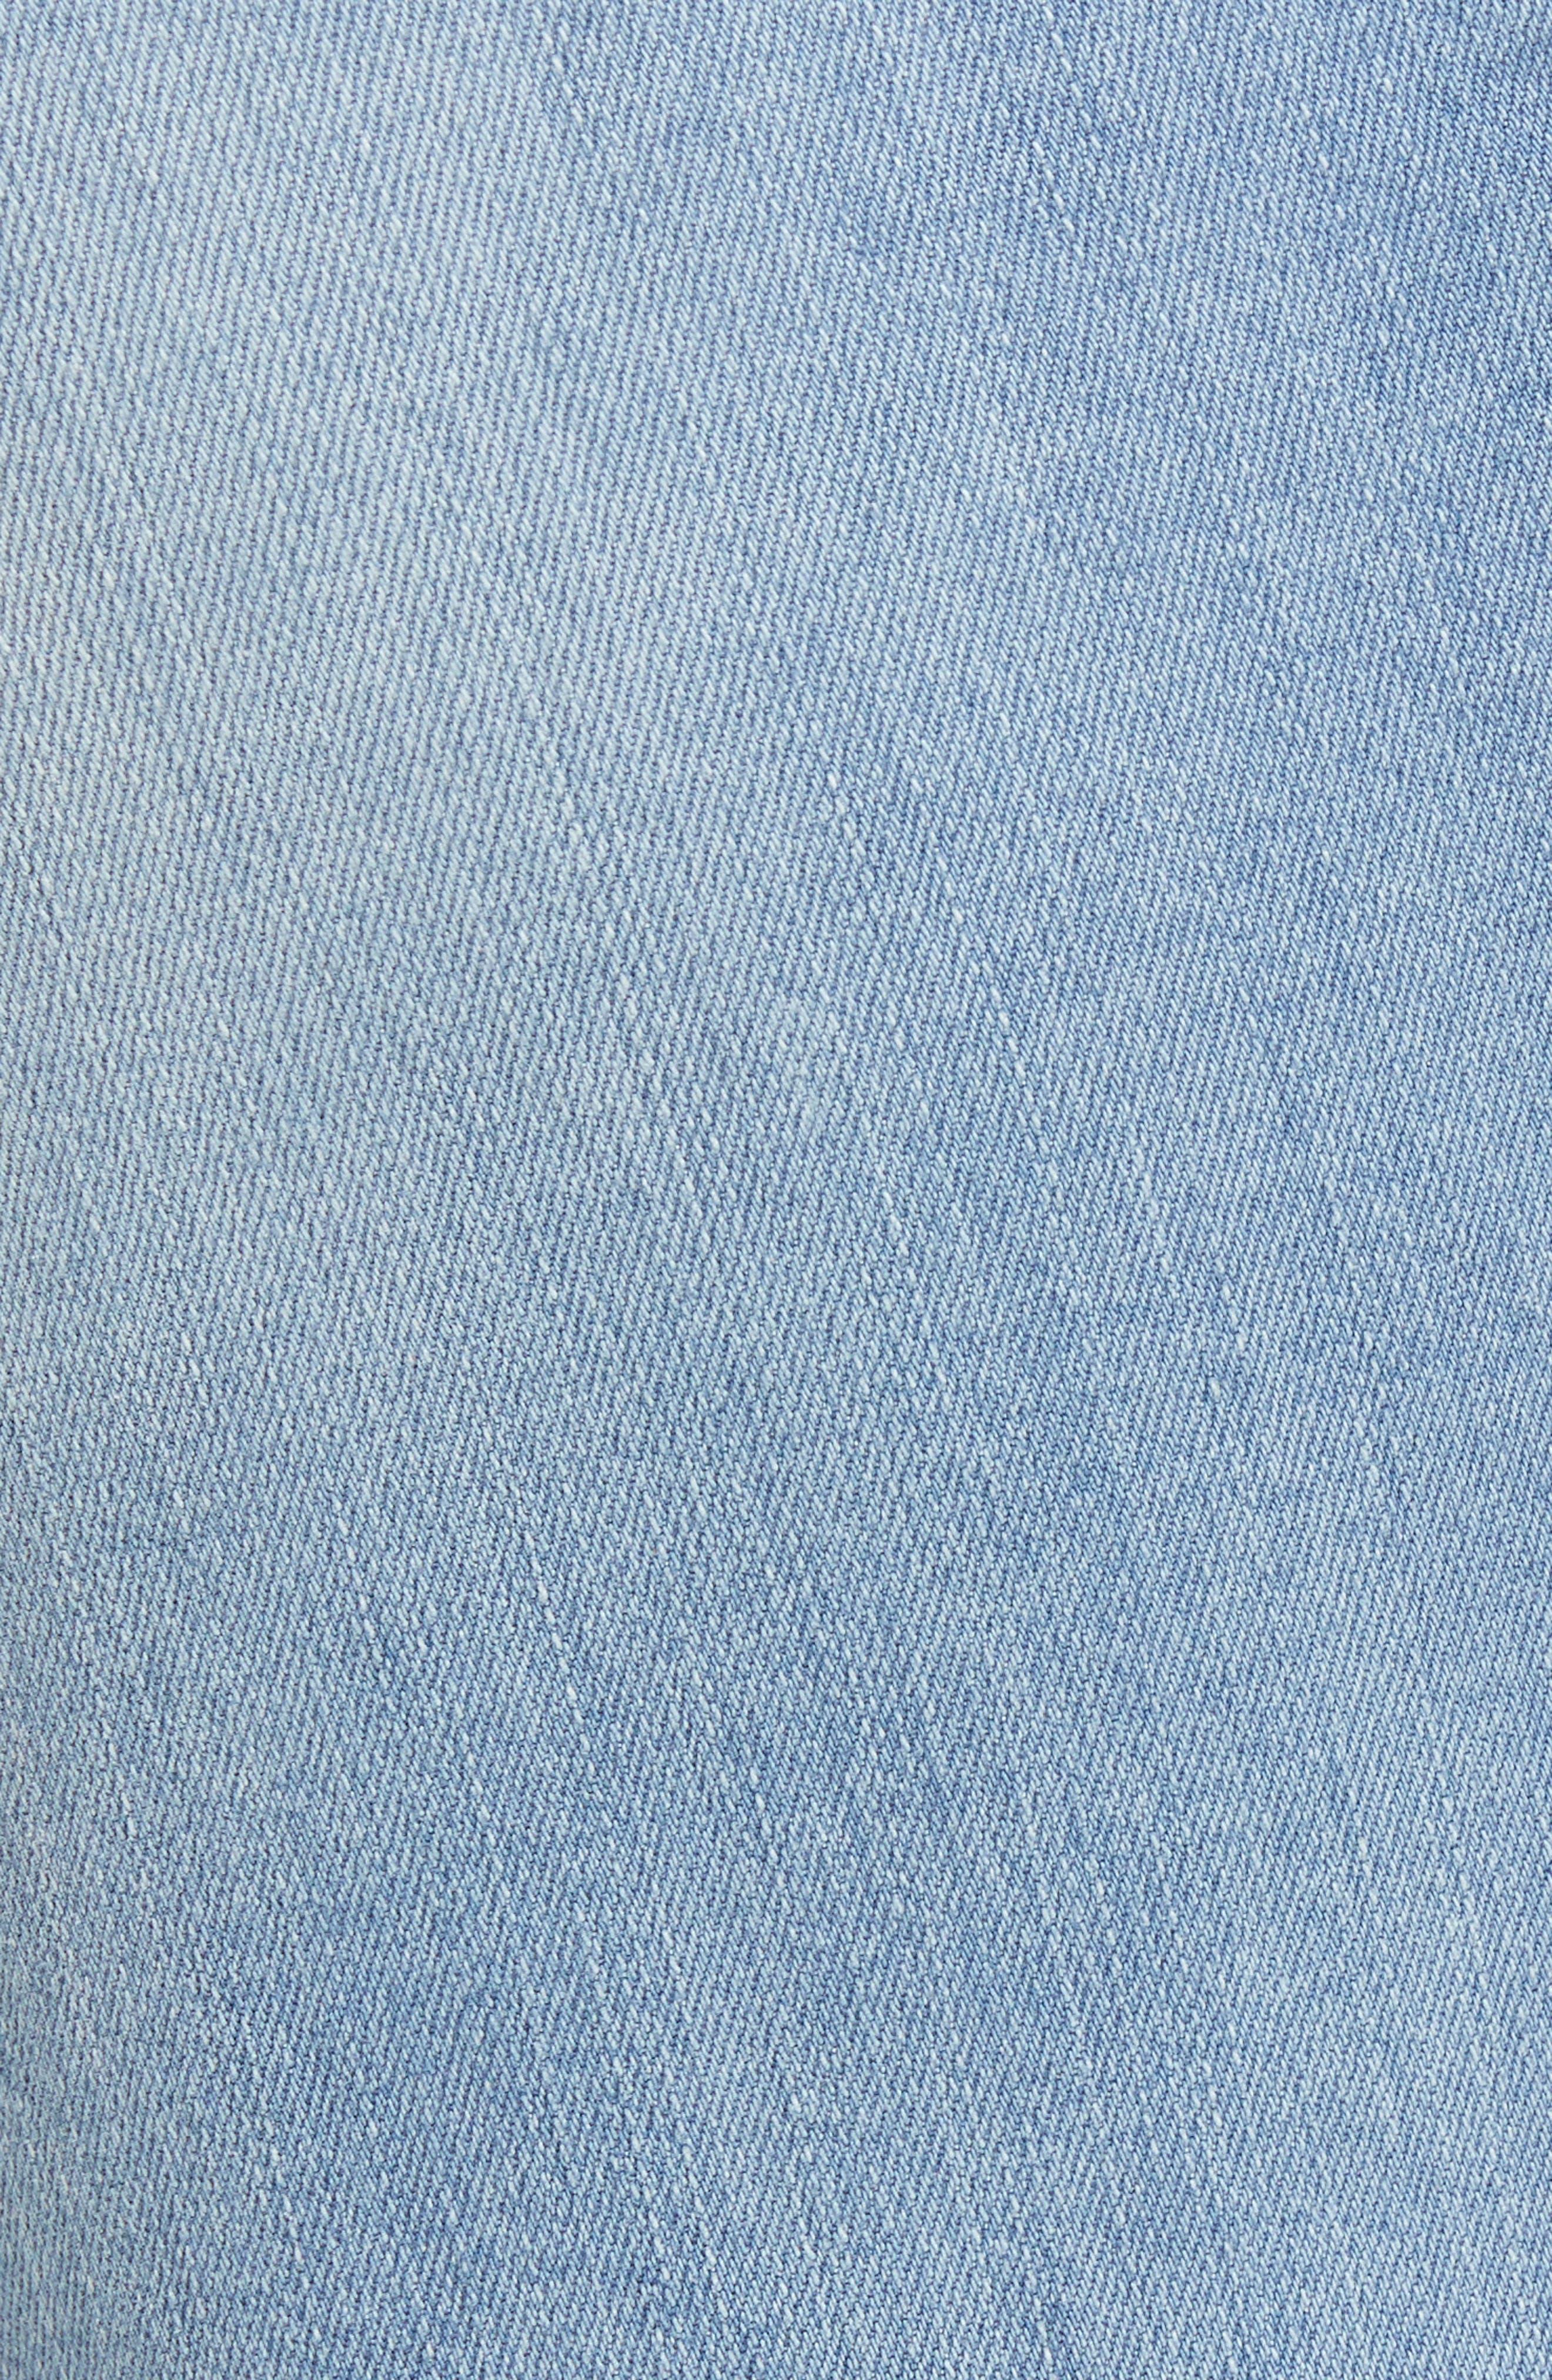 Lea Boyfriend Ripped Jeans,                             Alternate thumbnail 6, color,                             420